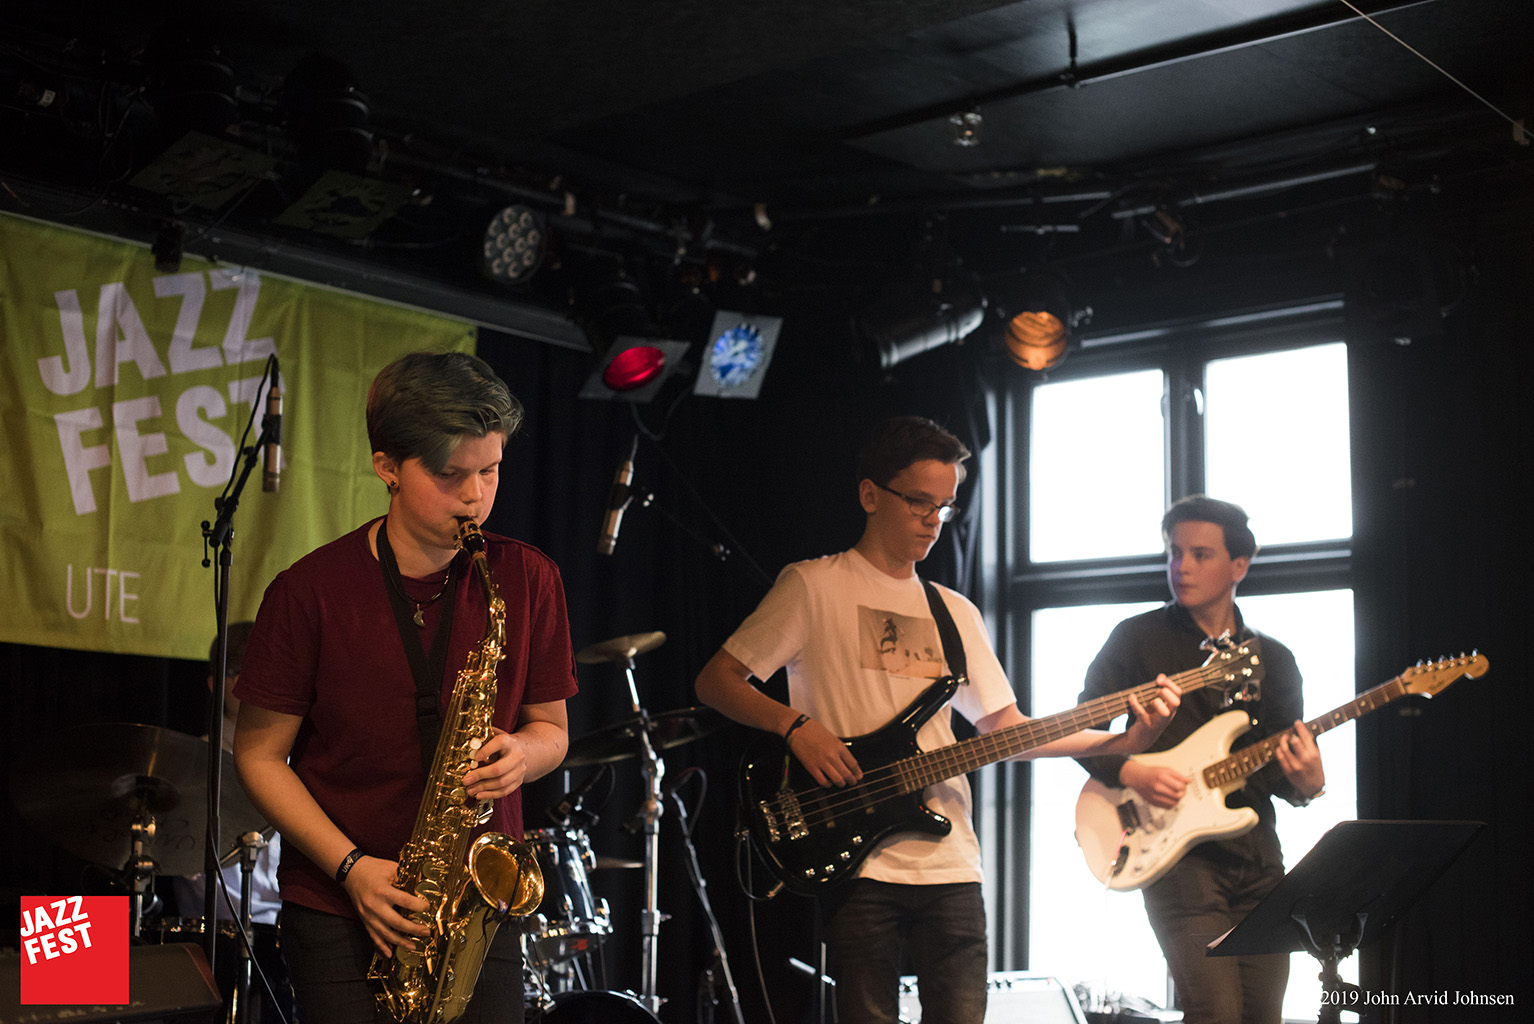 190511 Jazzfest Ung @ Isak Kultursenter (foto John Arvid Johnsen) _ 3.jpg